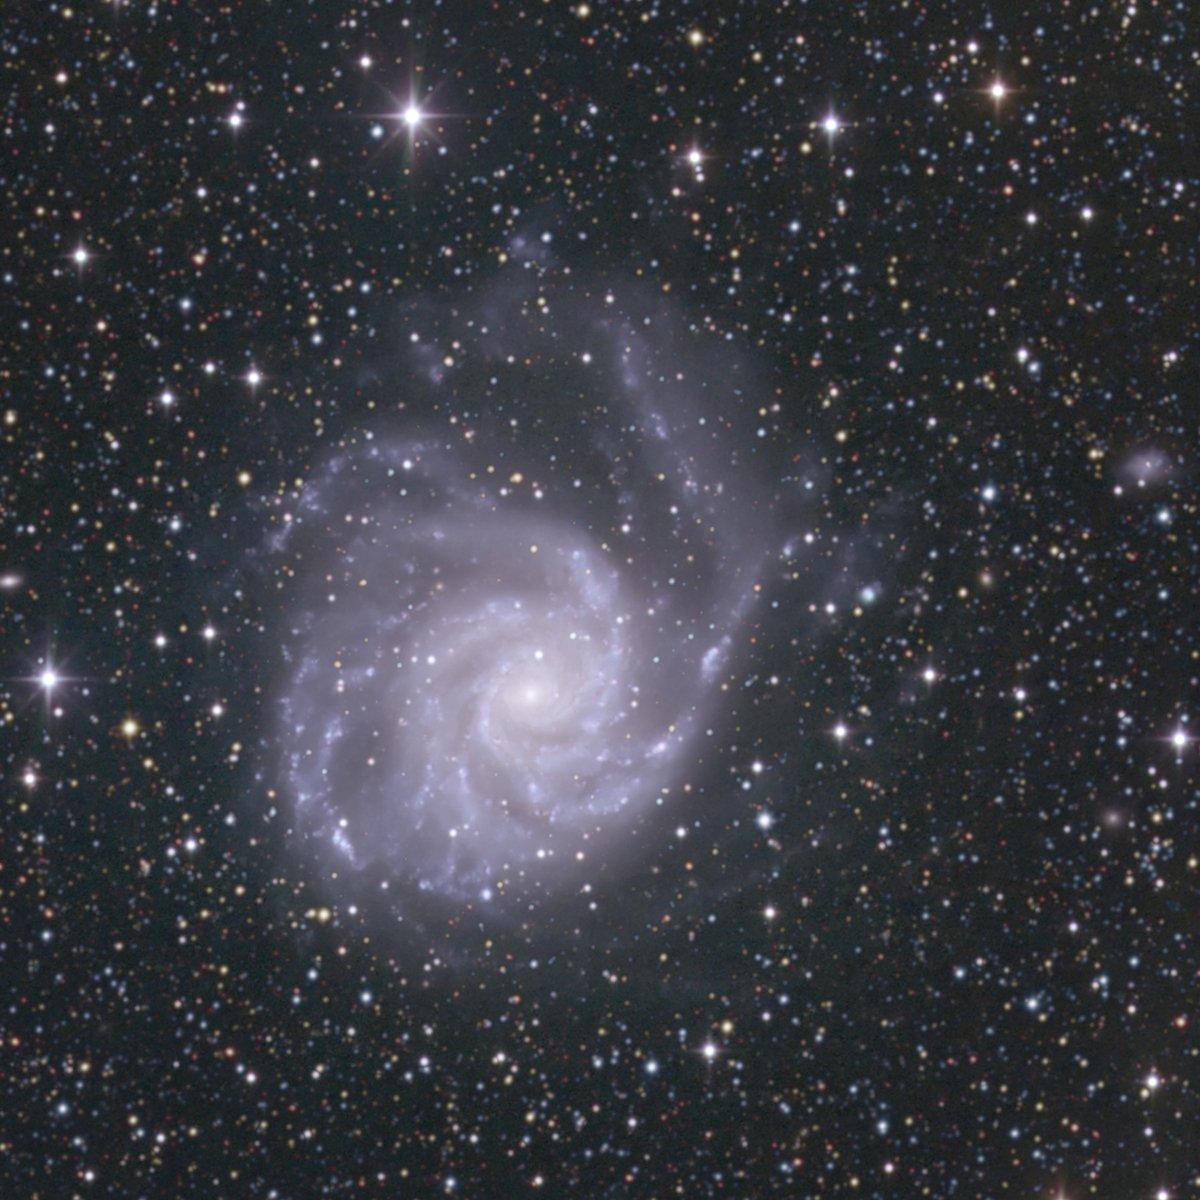 астрономия, небо, ночь, звёзды, гала, Константин Миронов